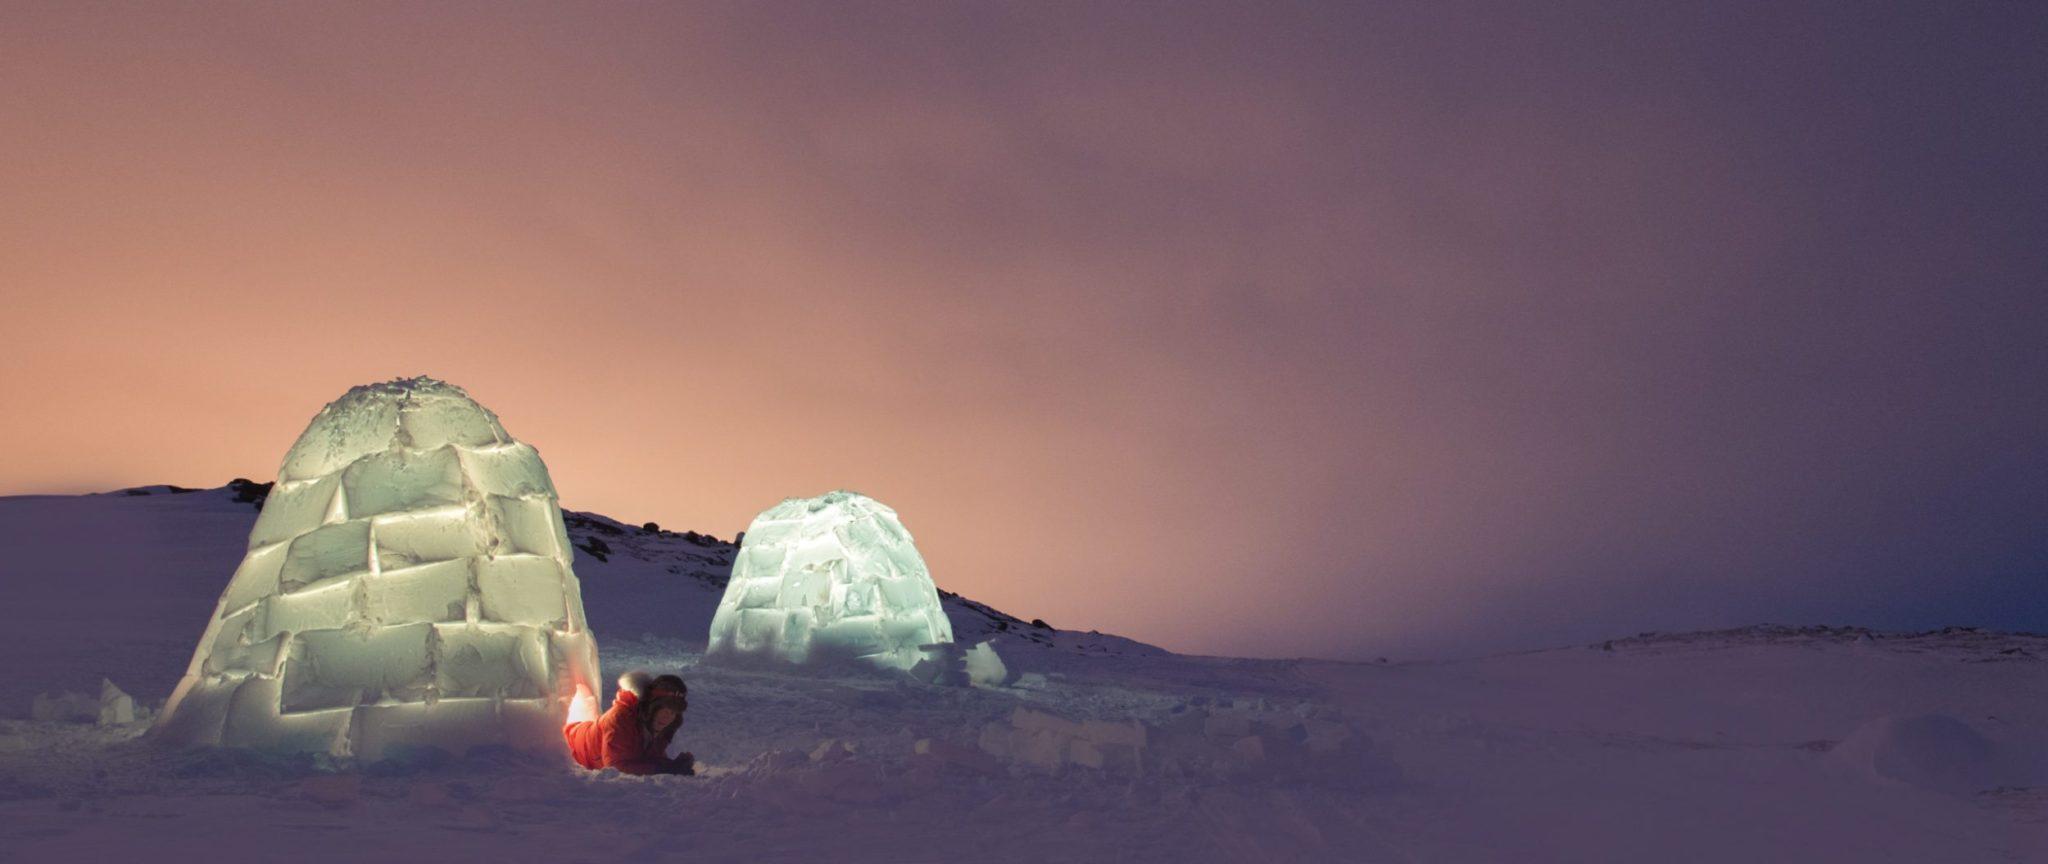 Explore Iqaluit Nunavut Tourism & Guide   Arctic Kingdom